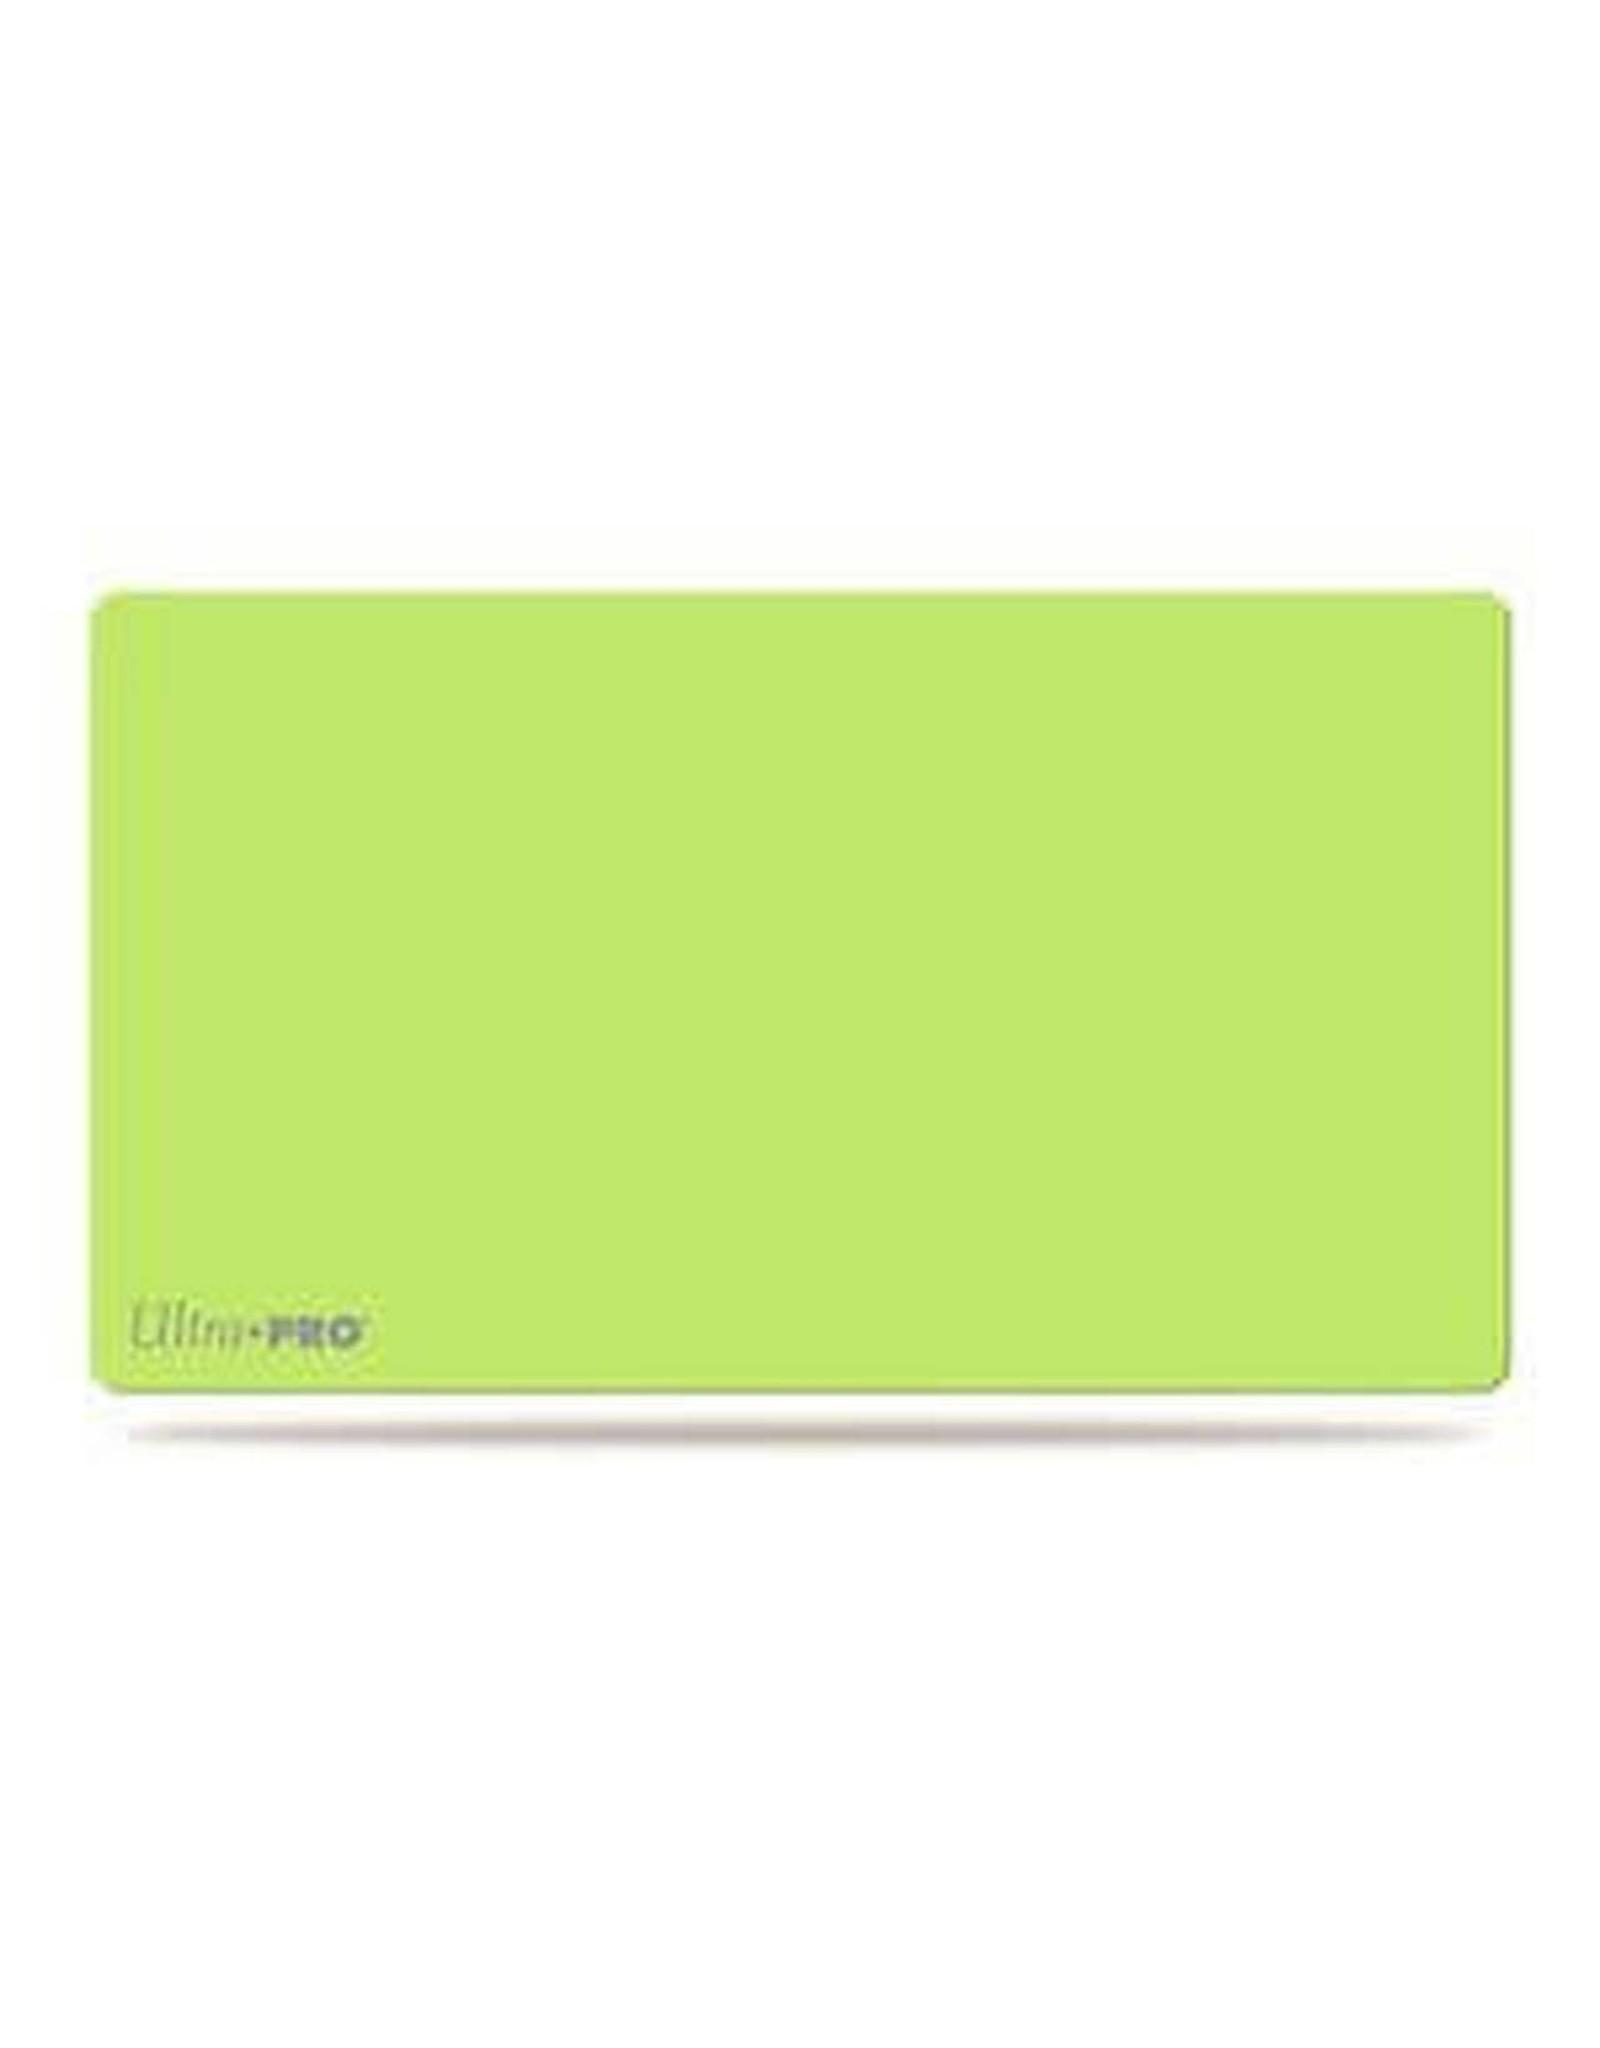 Ultra Pro Artist Gallery Lime Green Playmat